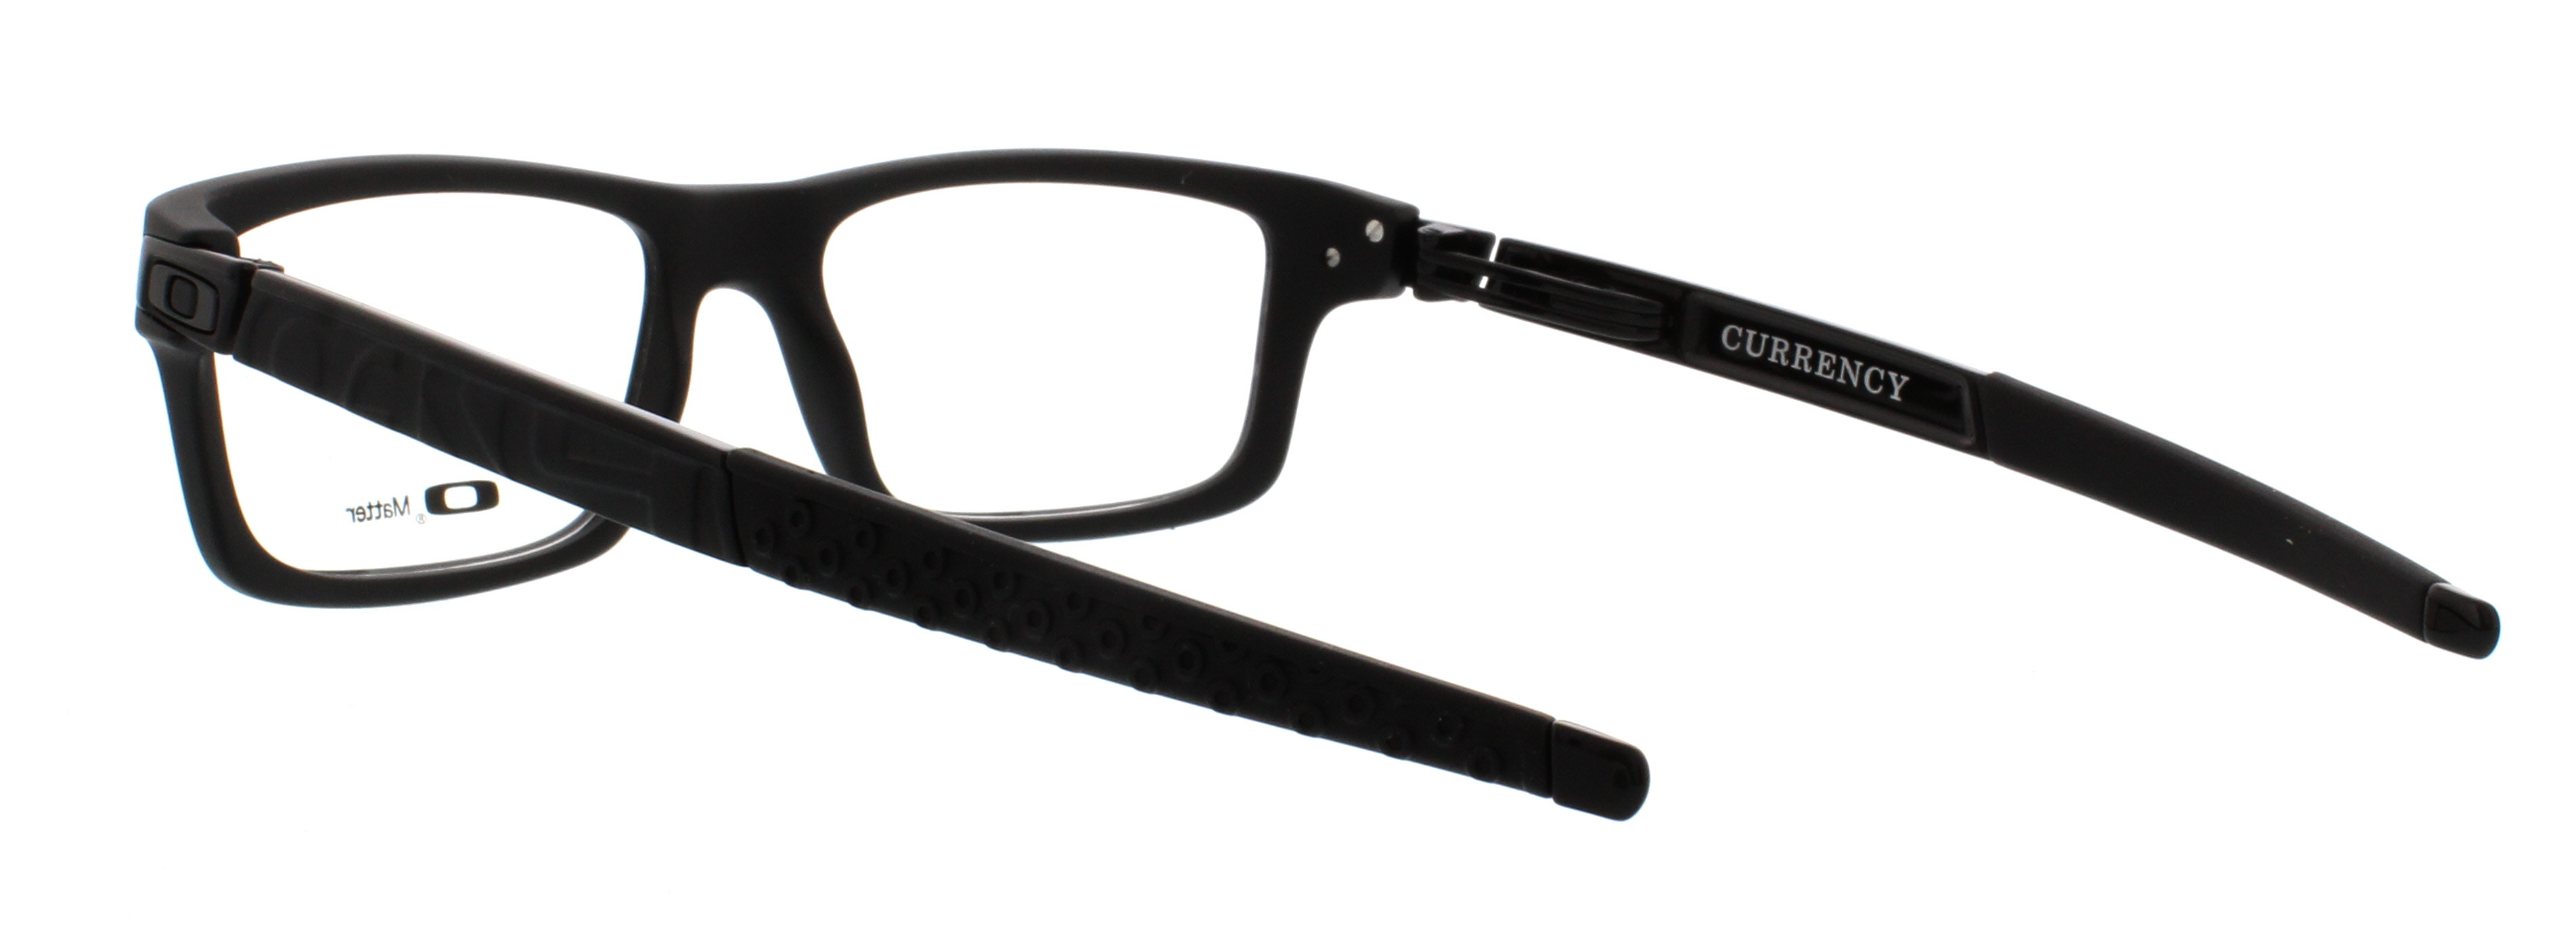 6f6d8672db Oakley Currency OX8026 01 54mm Unisex Rectangular Eyeglasses - Walmart.com